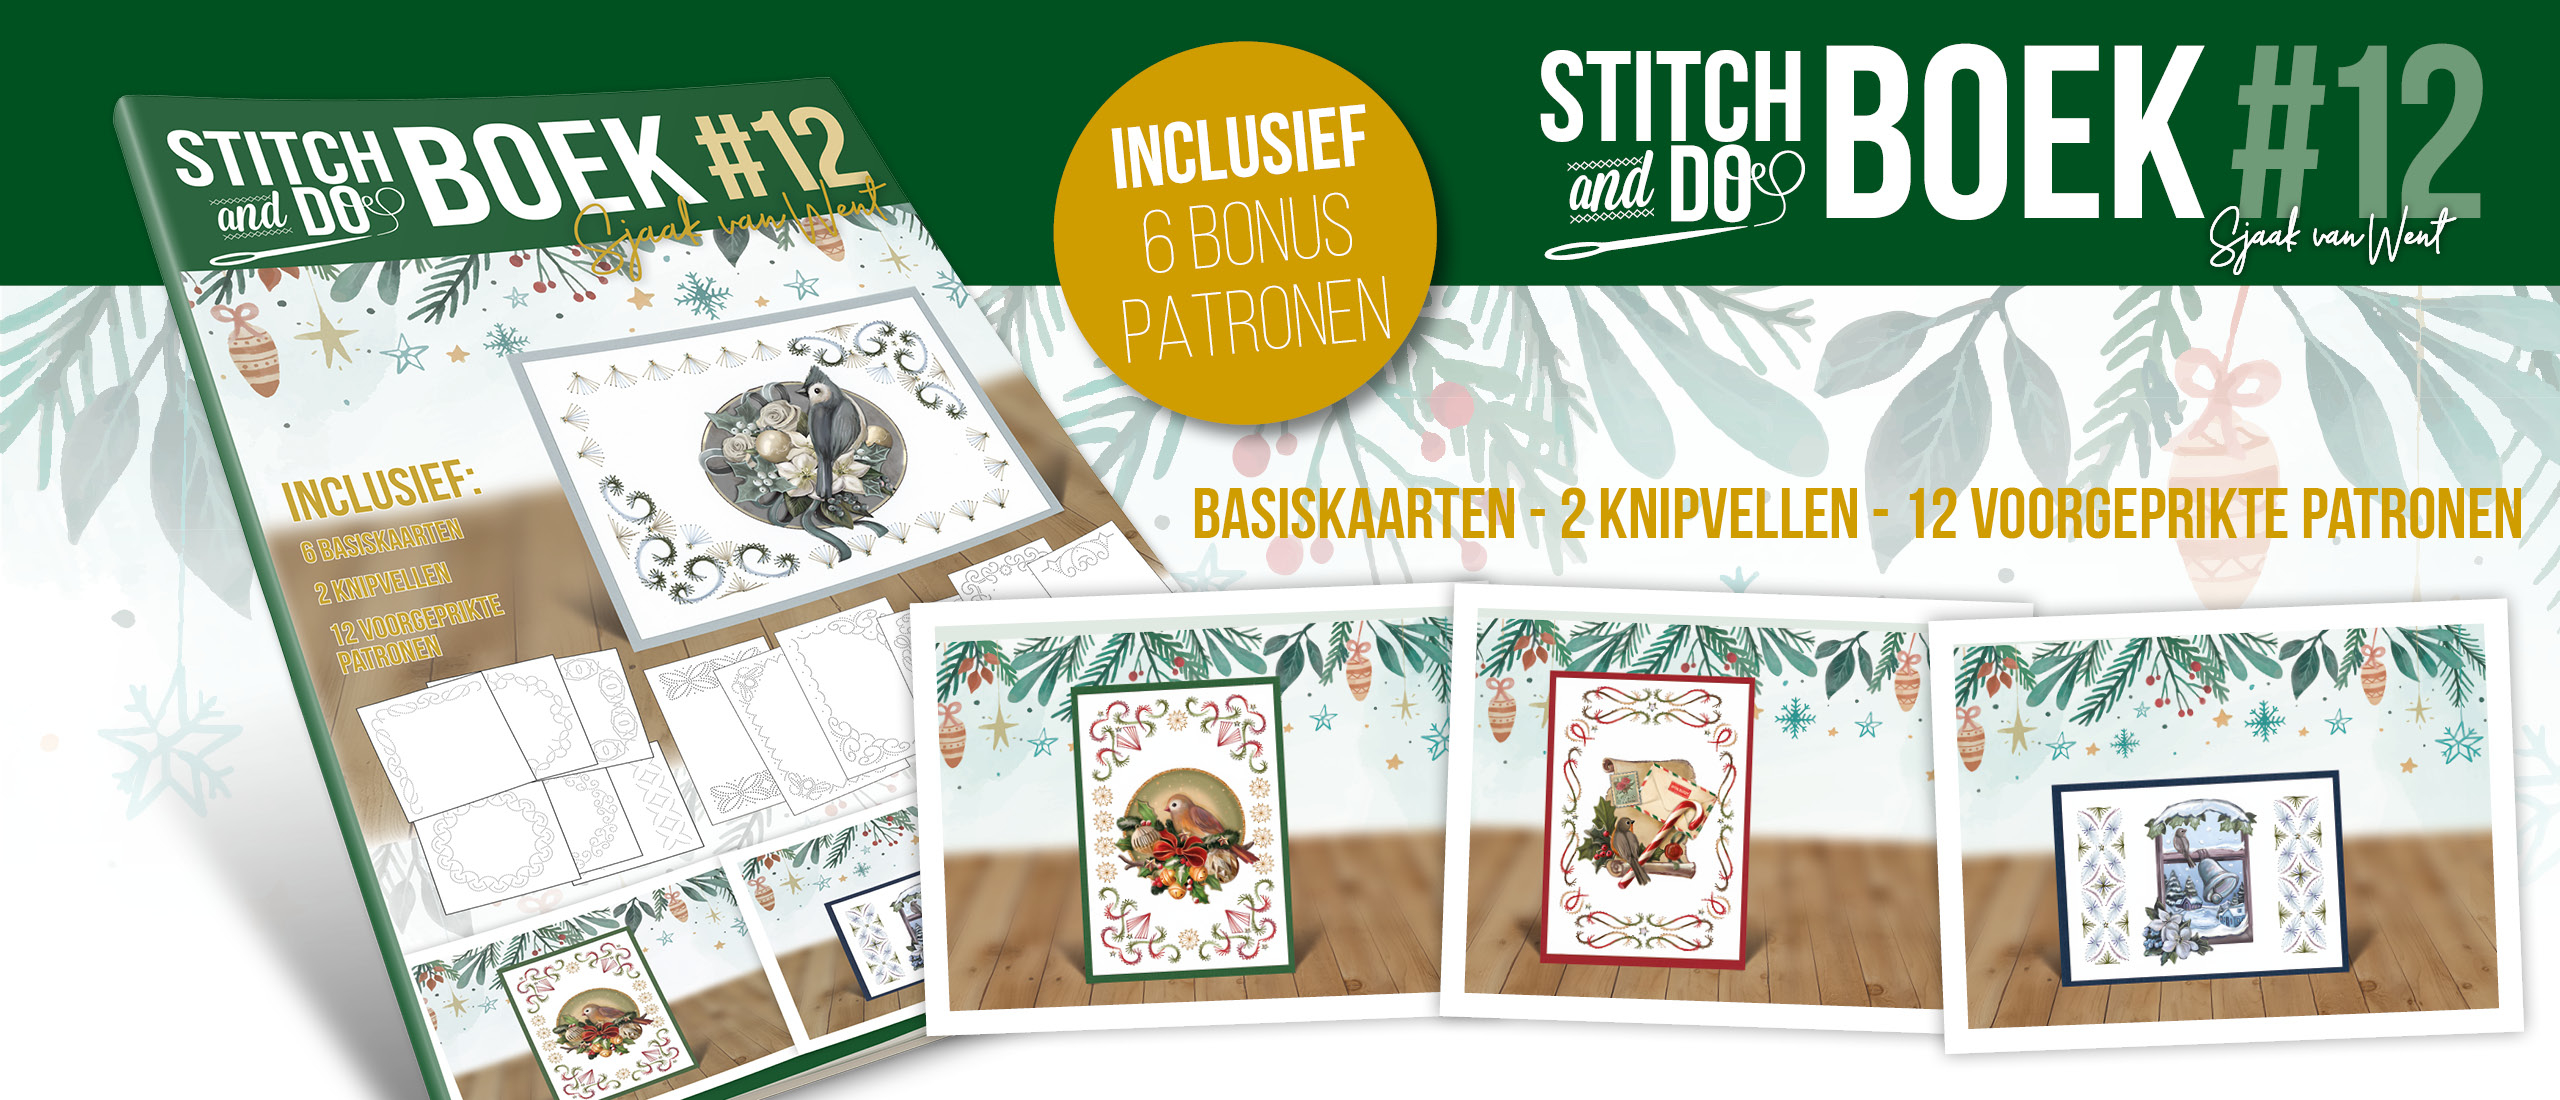 Stitch and do Book 12 Sjaak van Went